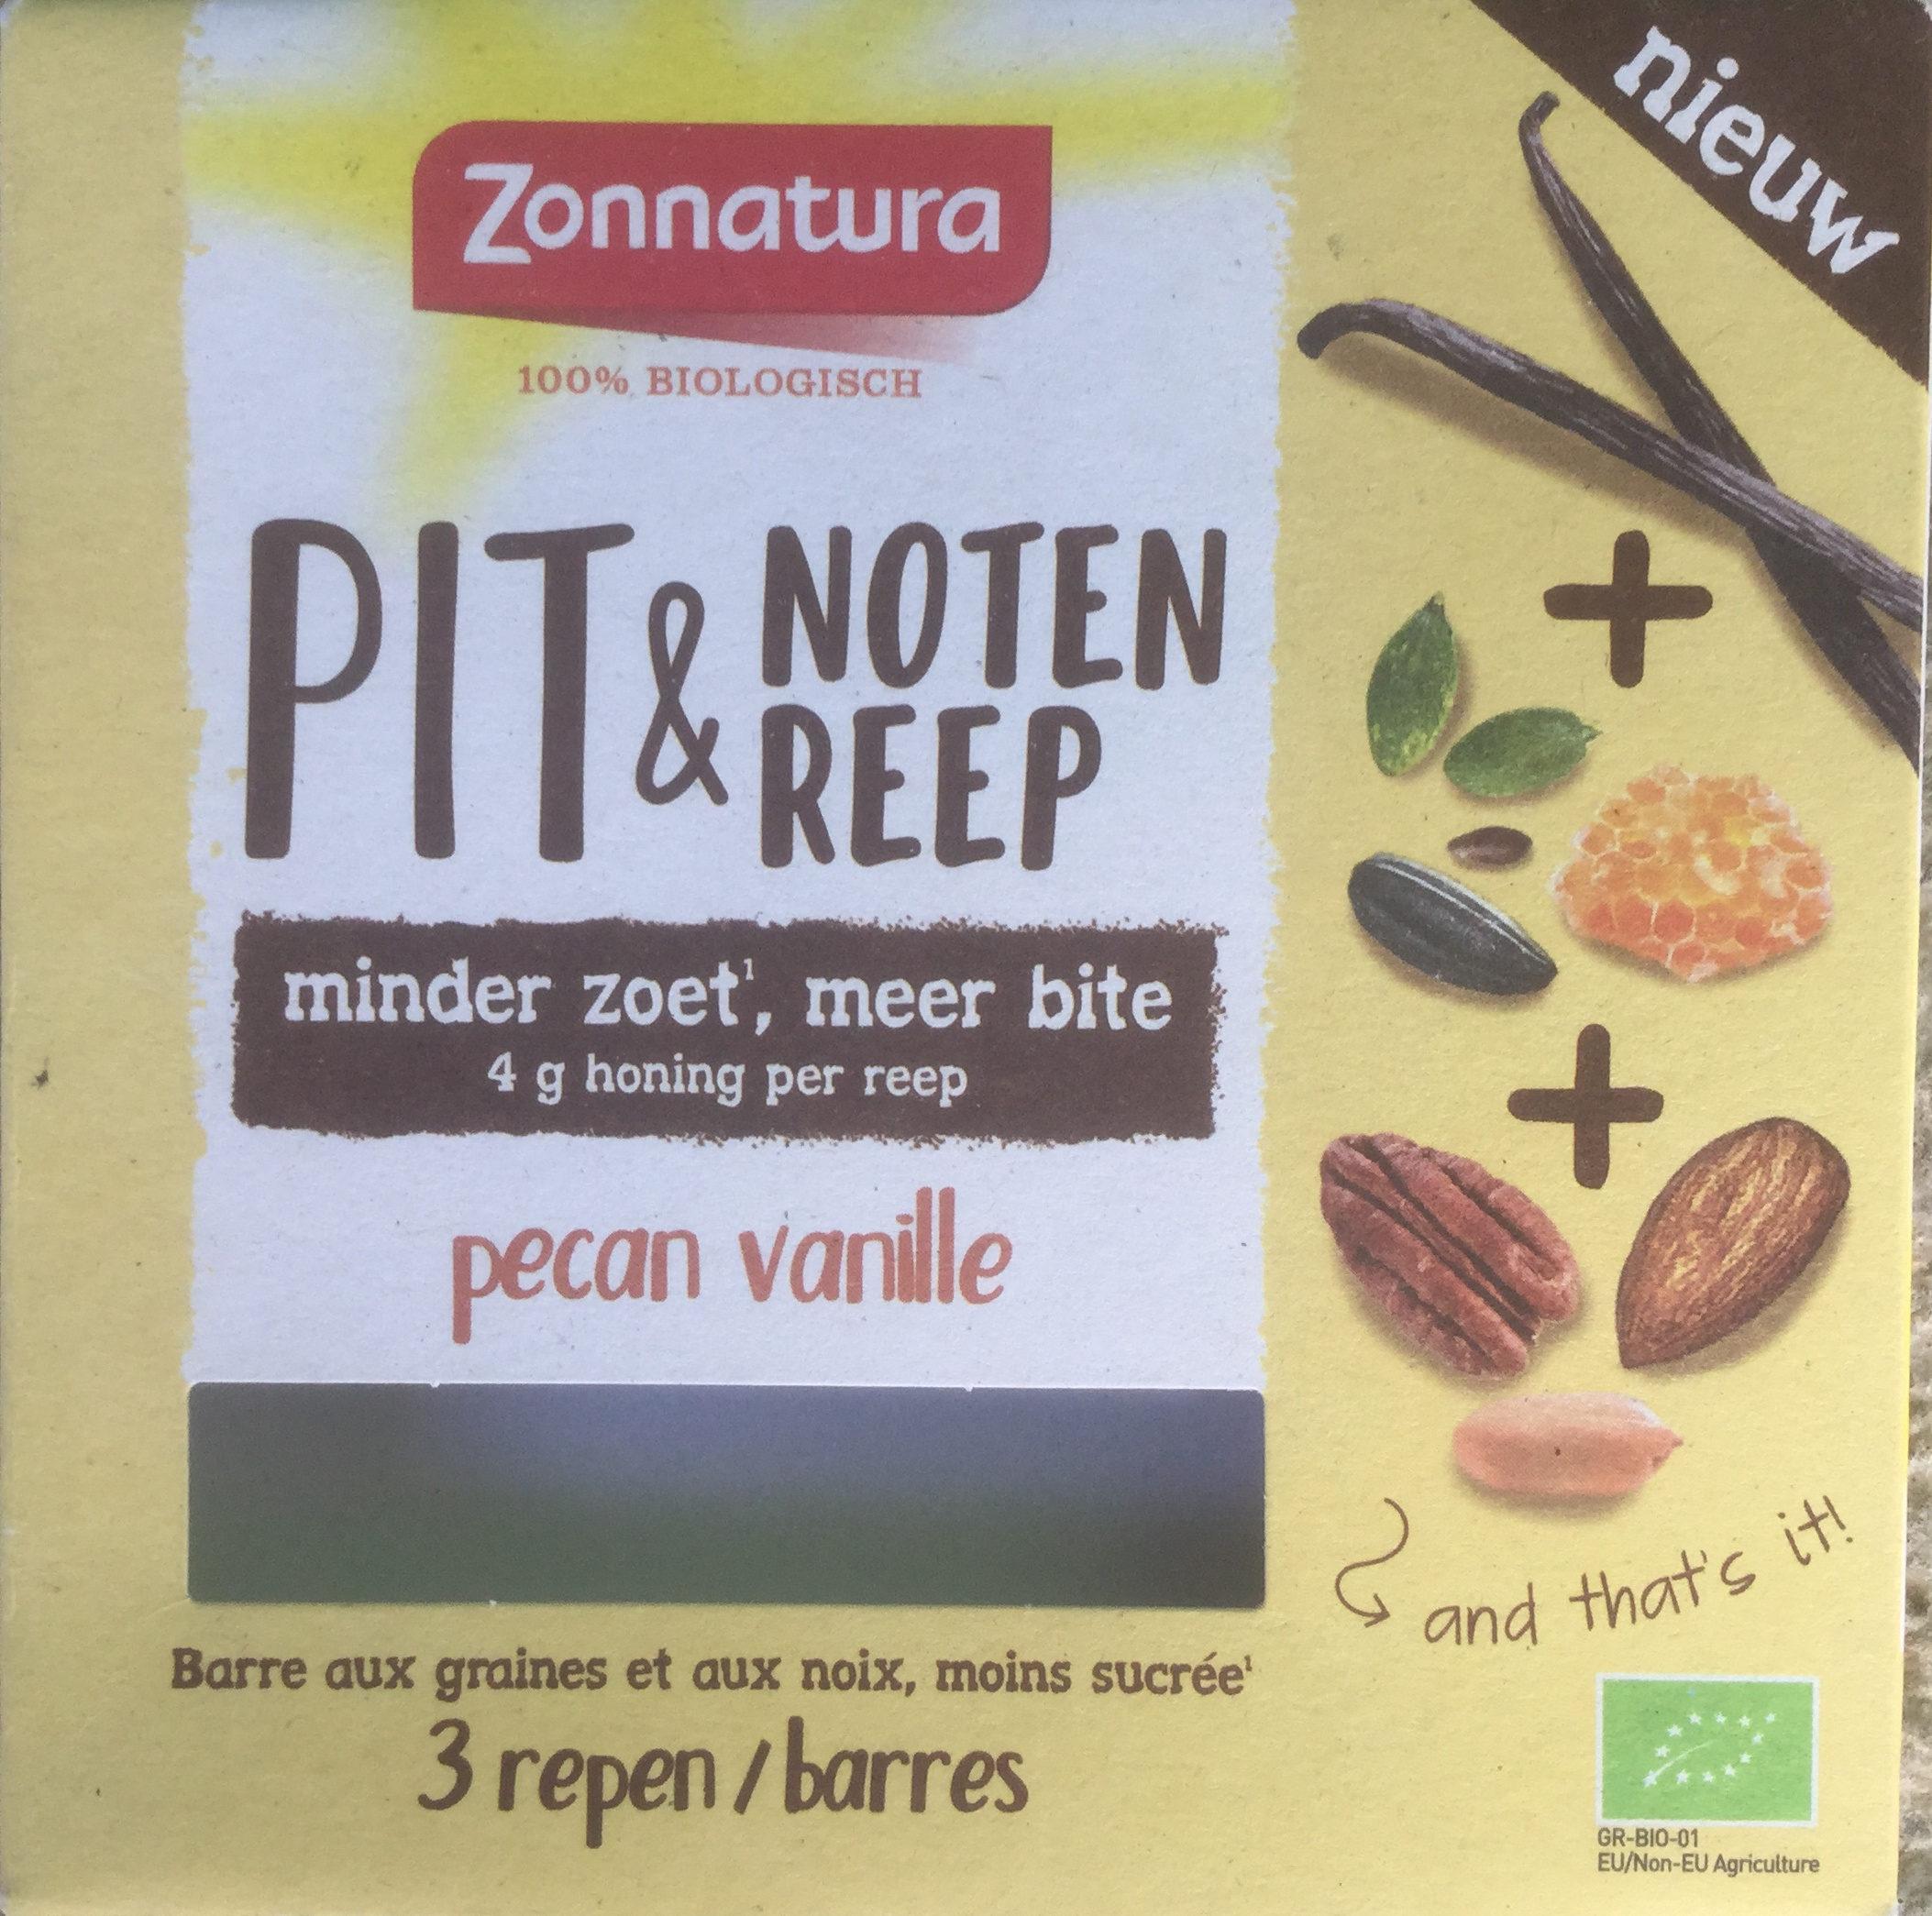 Pit & notenreep pecan vanille - Product